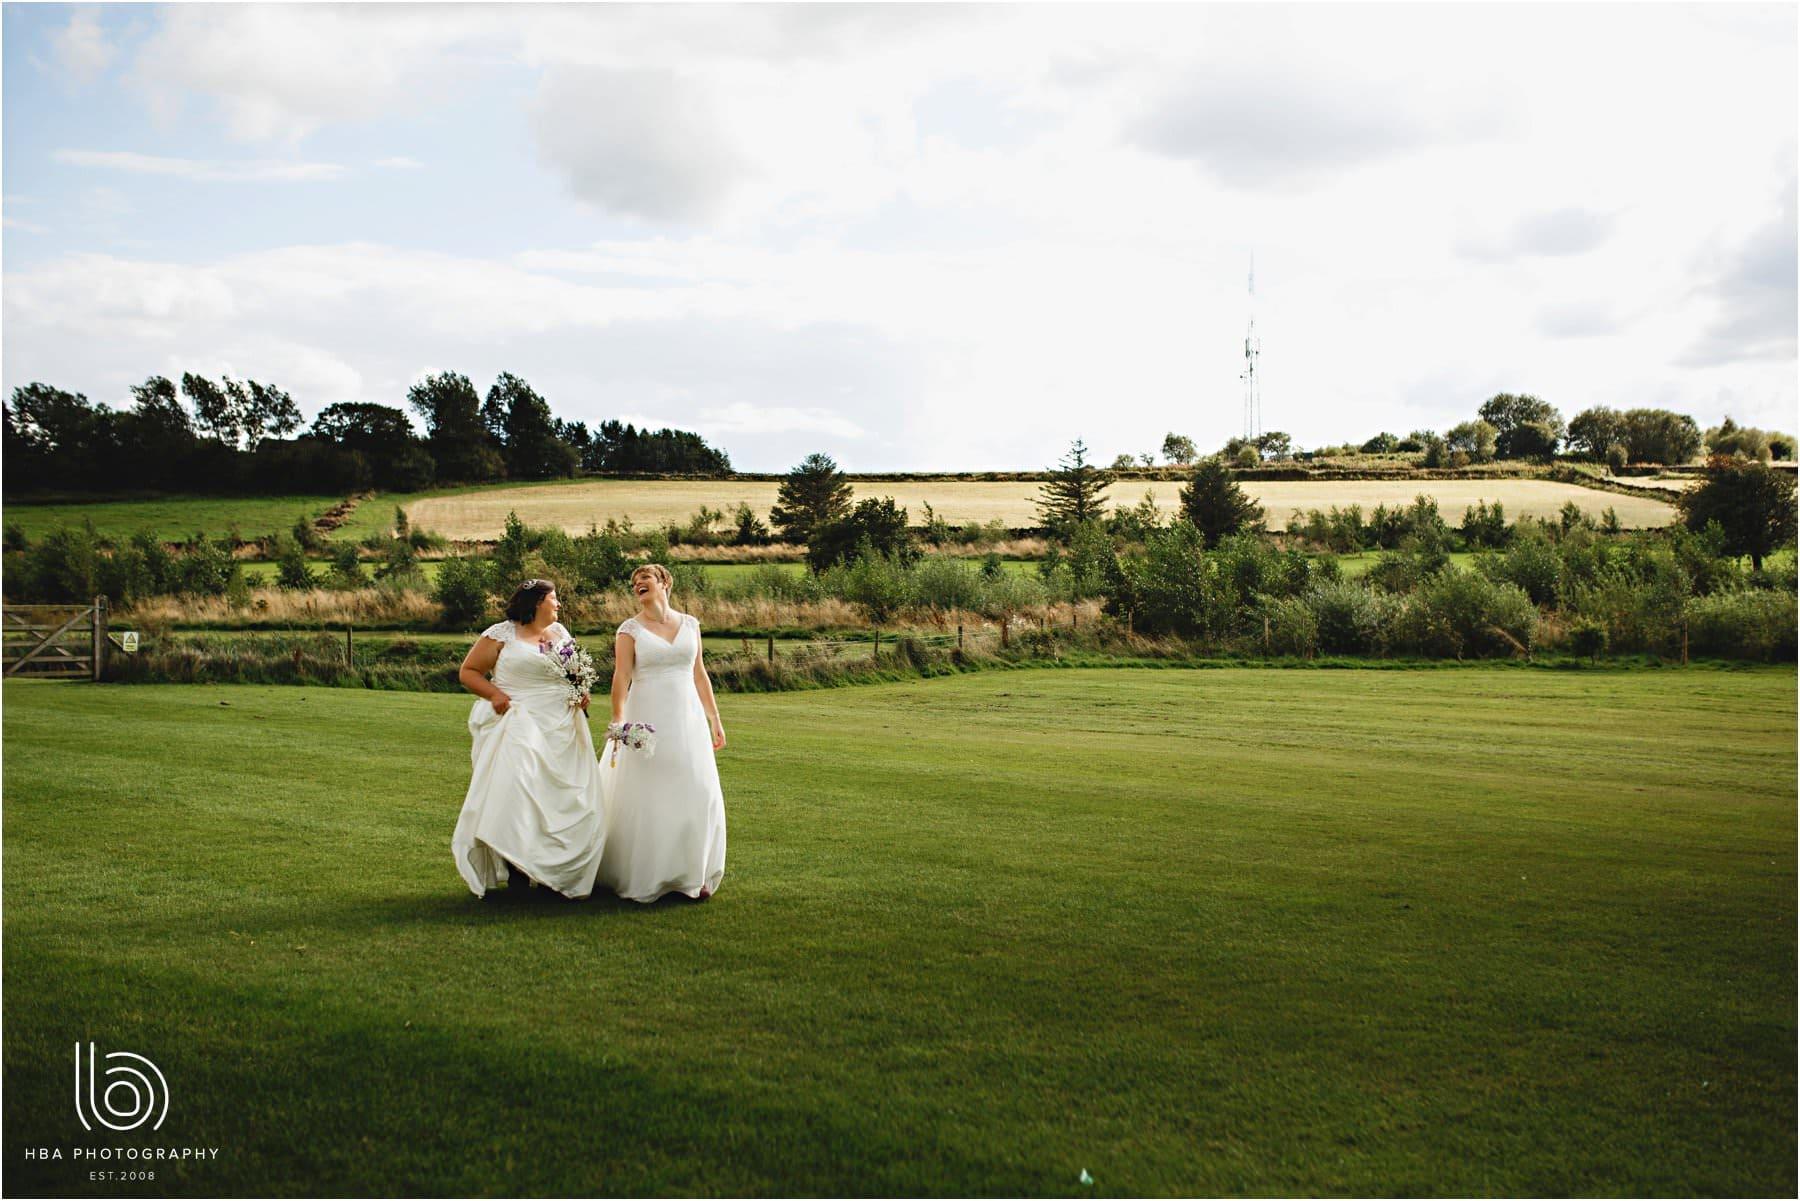 the two brides walking at Peak Edge